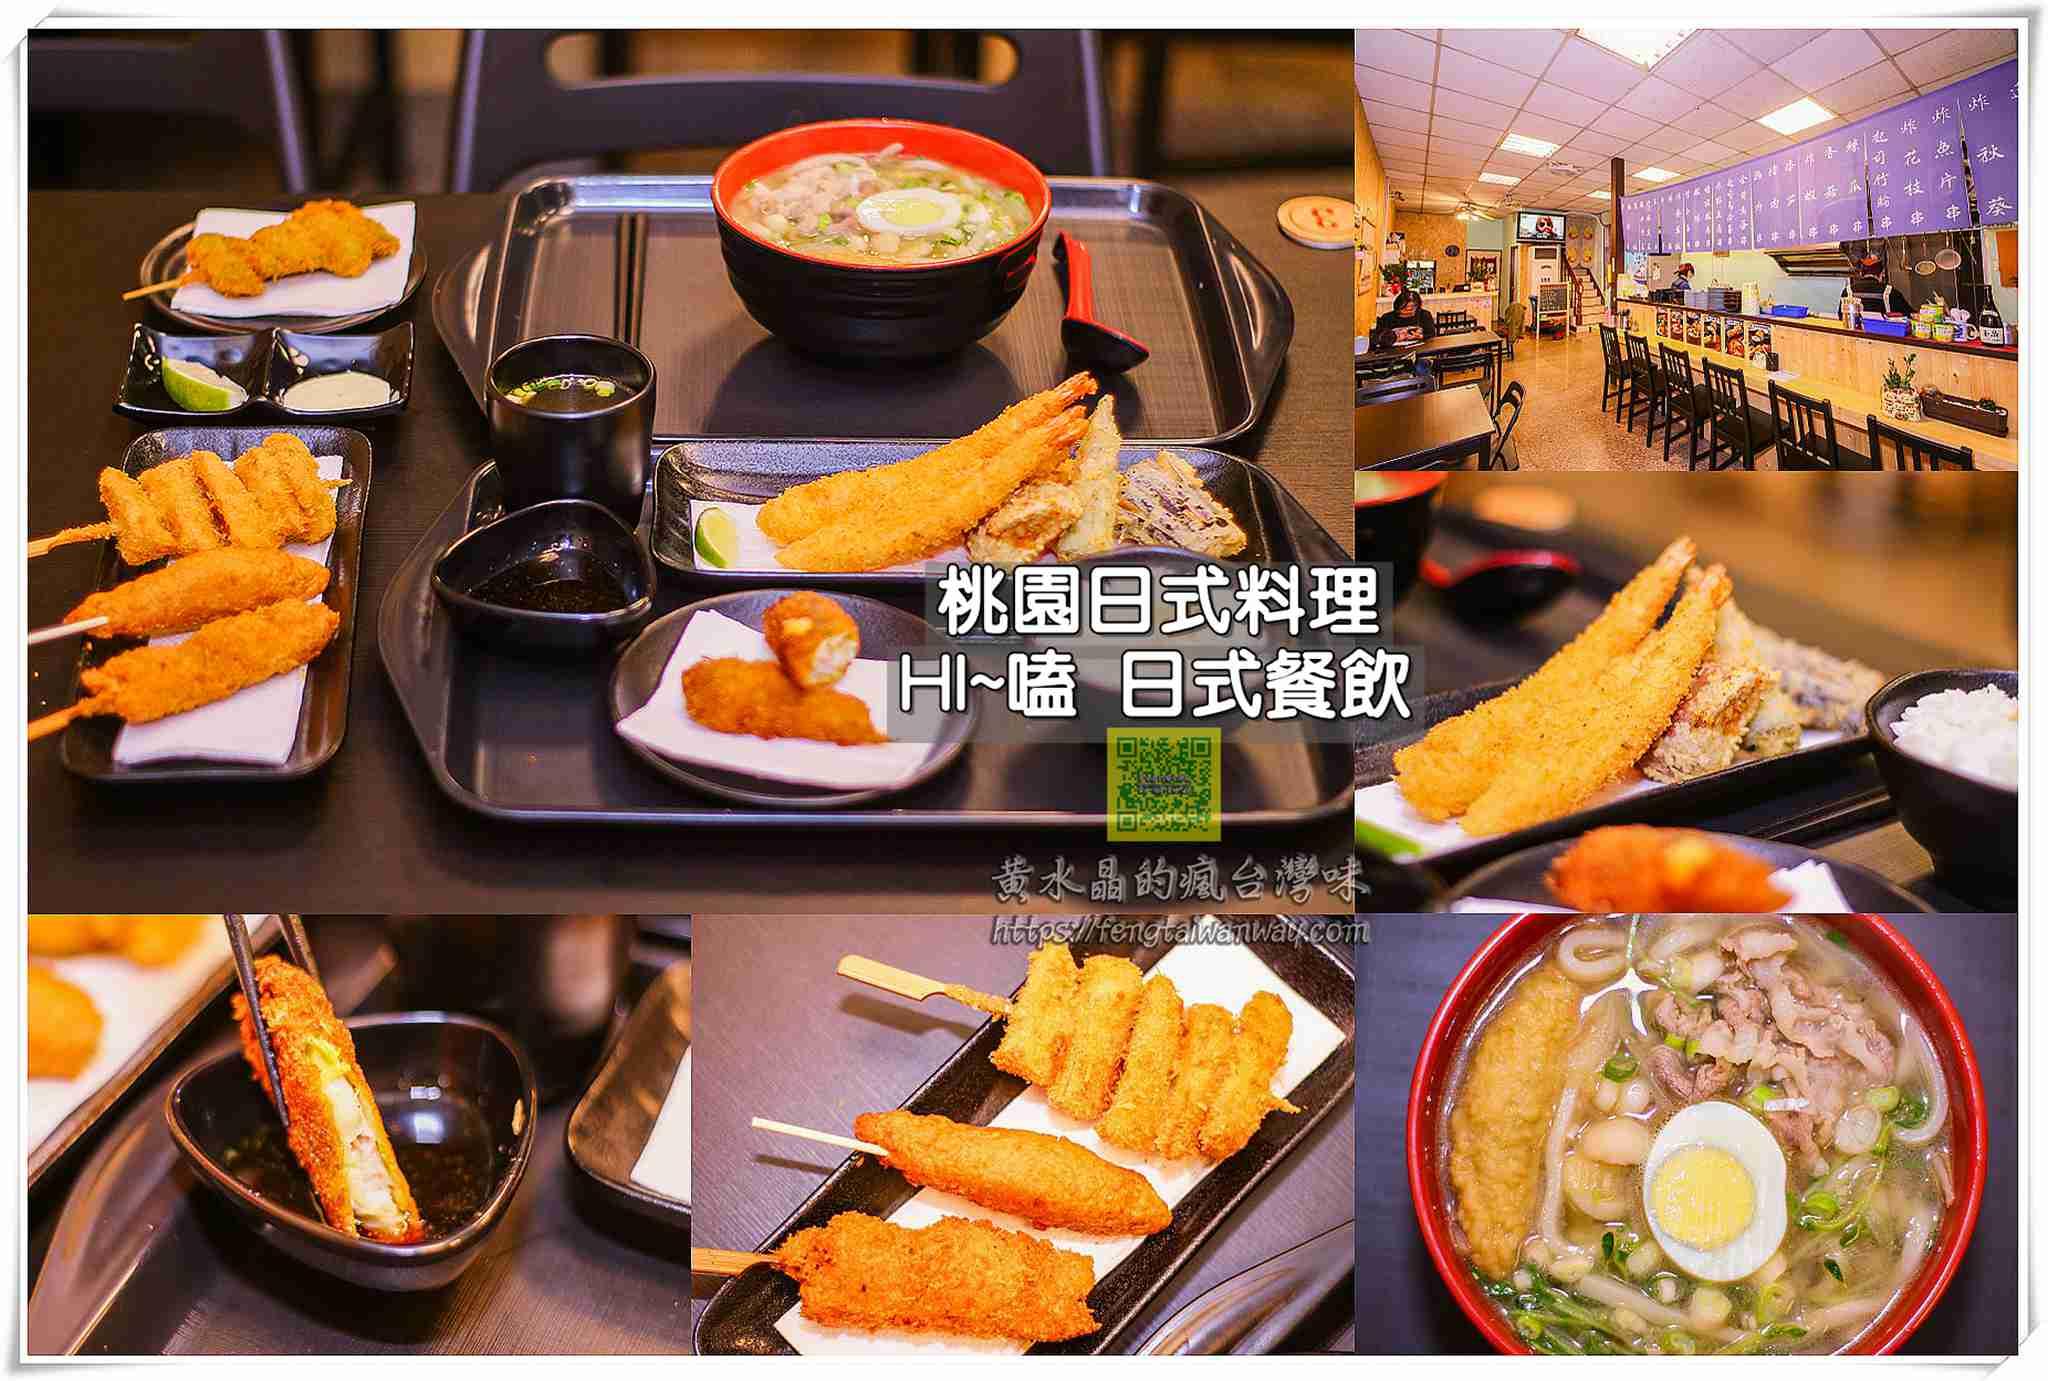 HI嗑日式餐飲【桃園美食】|日式丼飯、手作串炸、烏龍麵;上海路日式料理小食堂